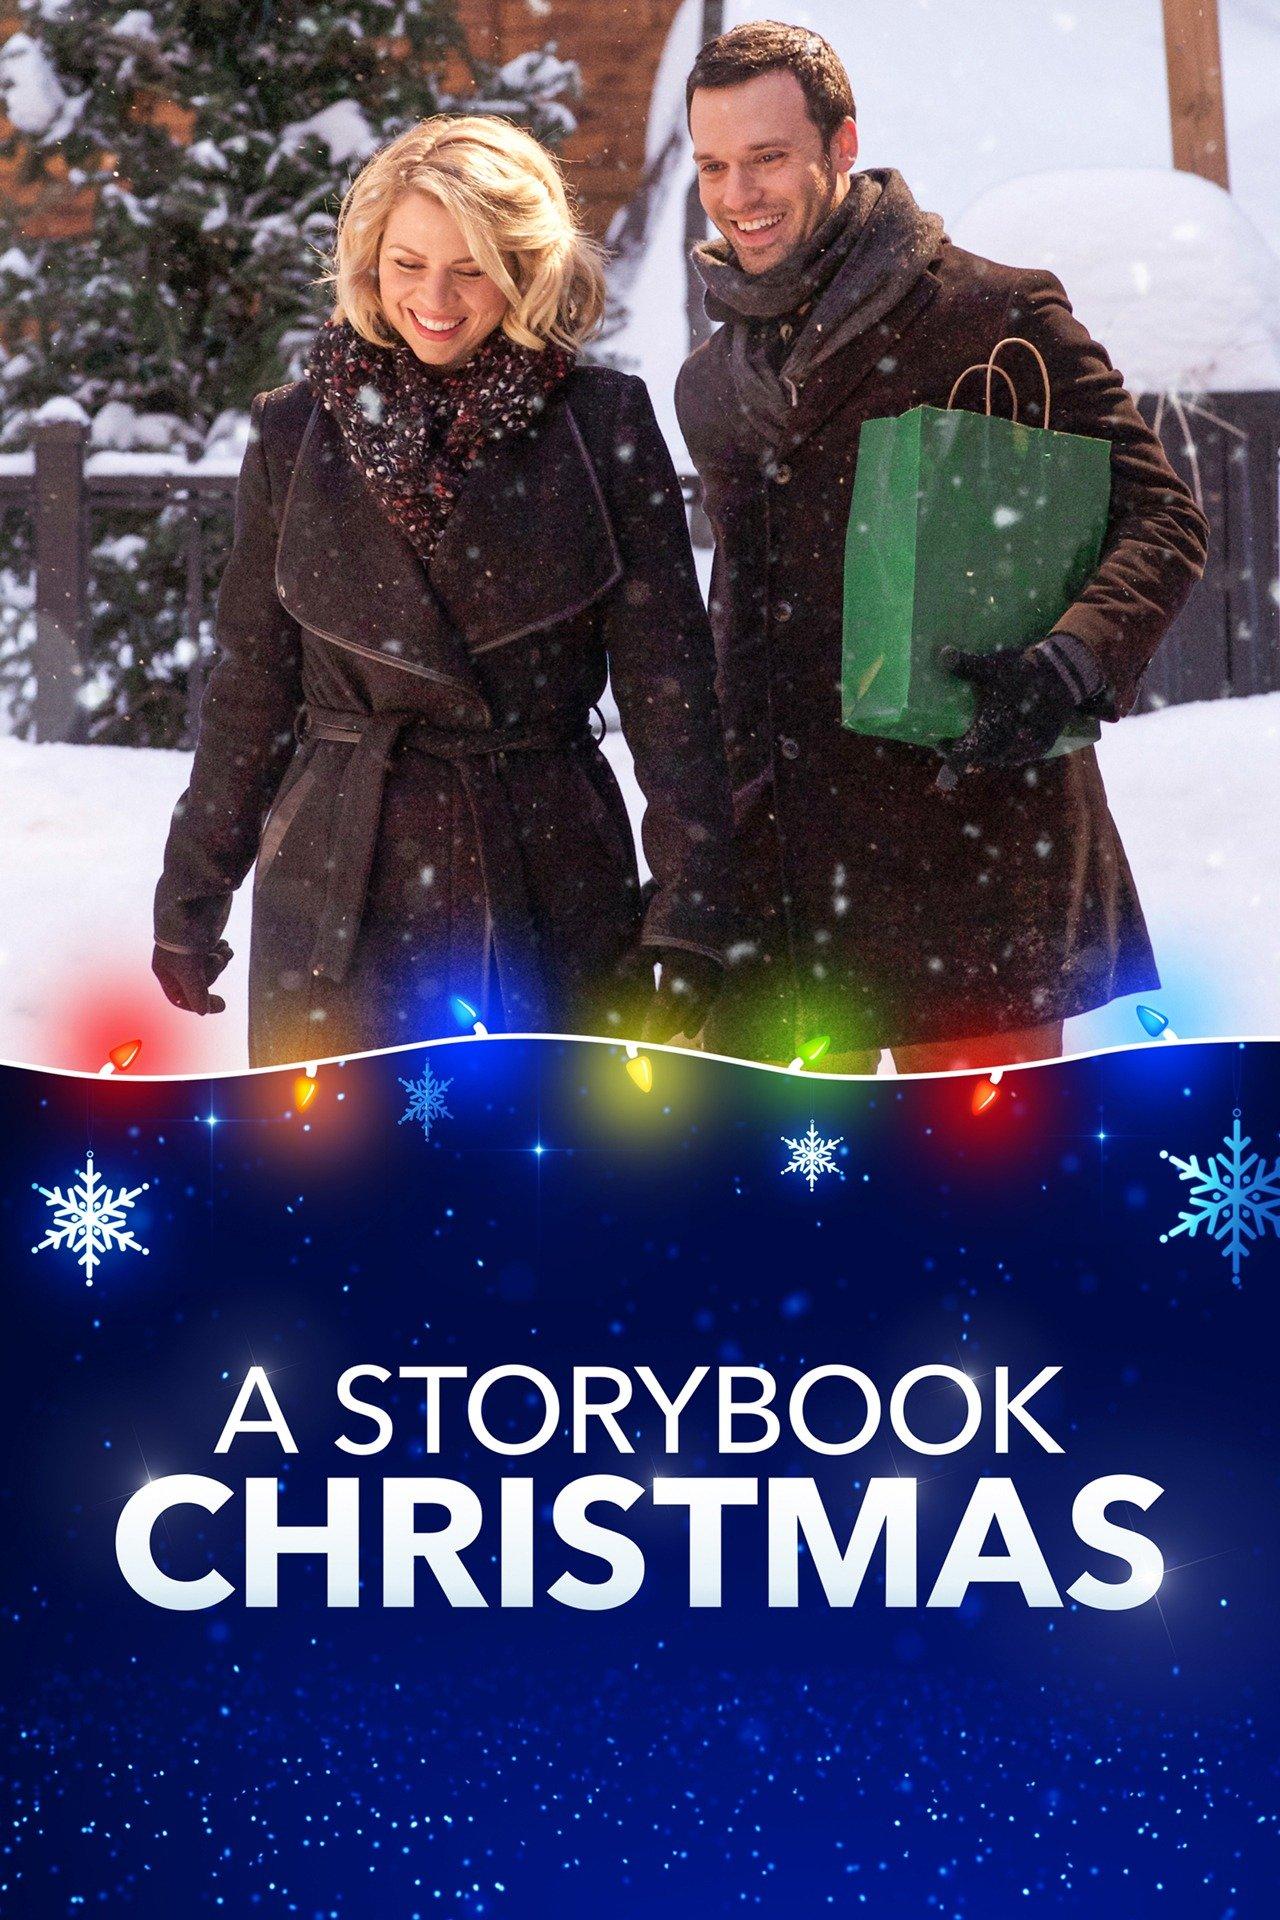 Storybook Christmas Tree Festival 2020 A Storybook Christmas (TV Movie 2019)   IMDb